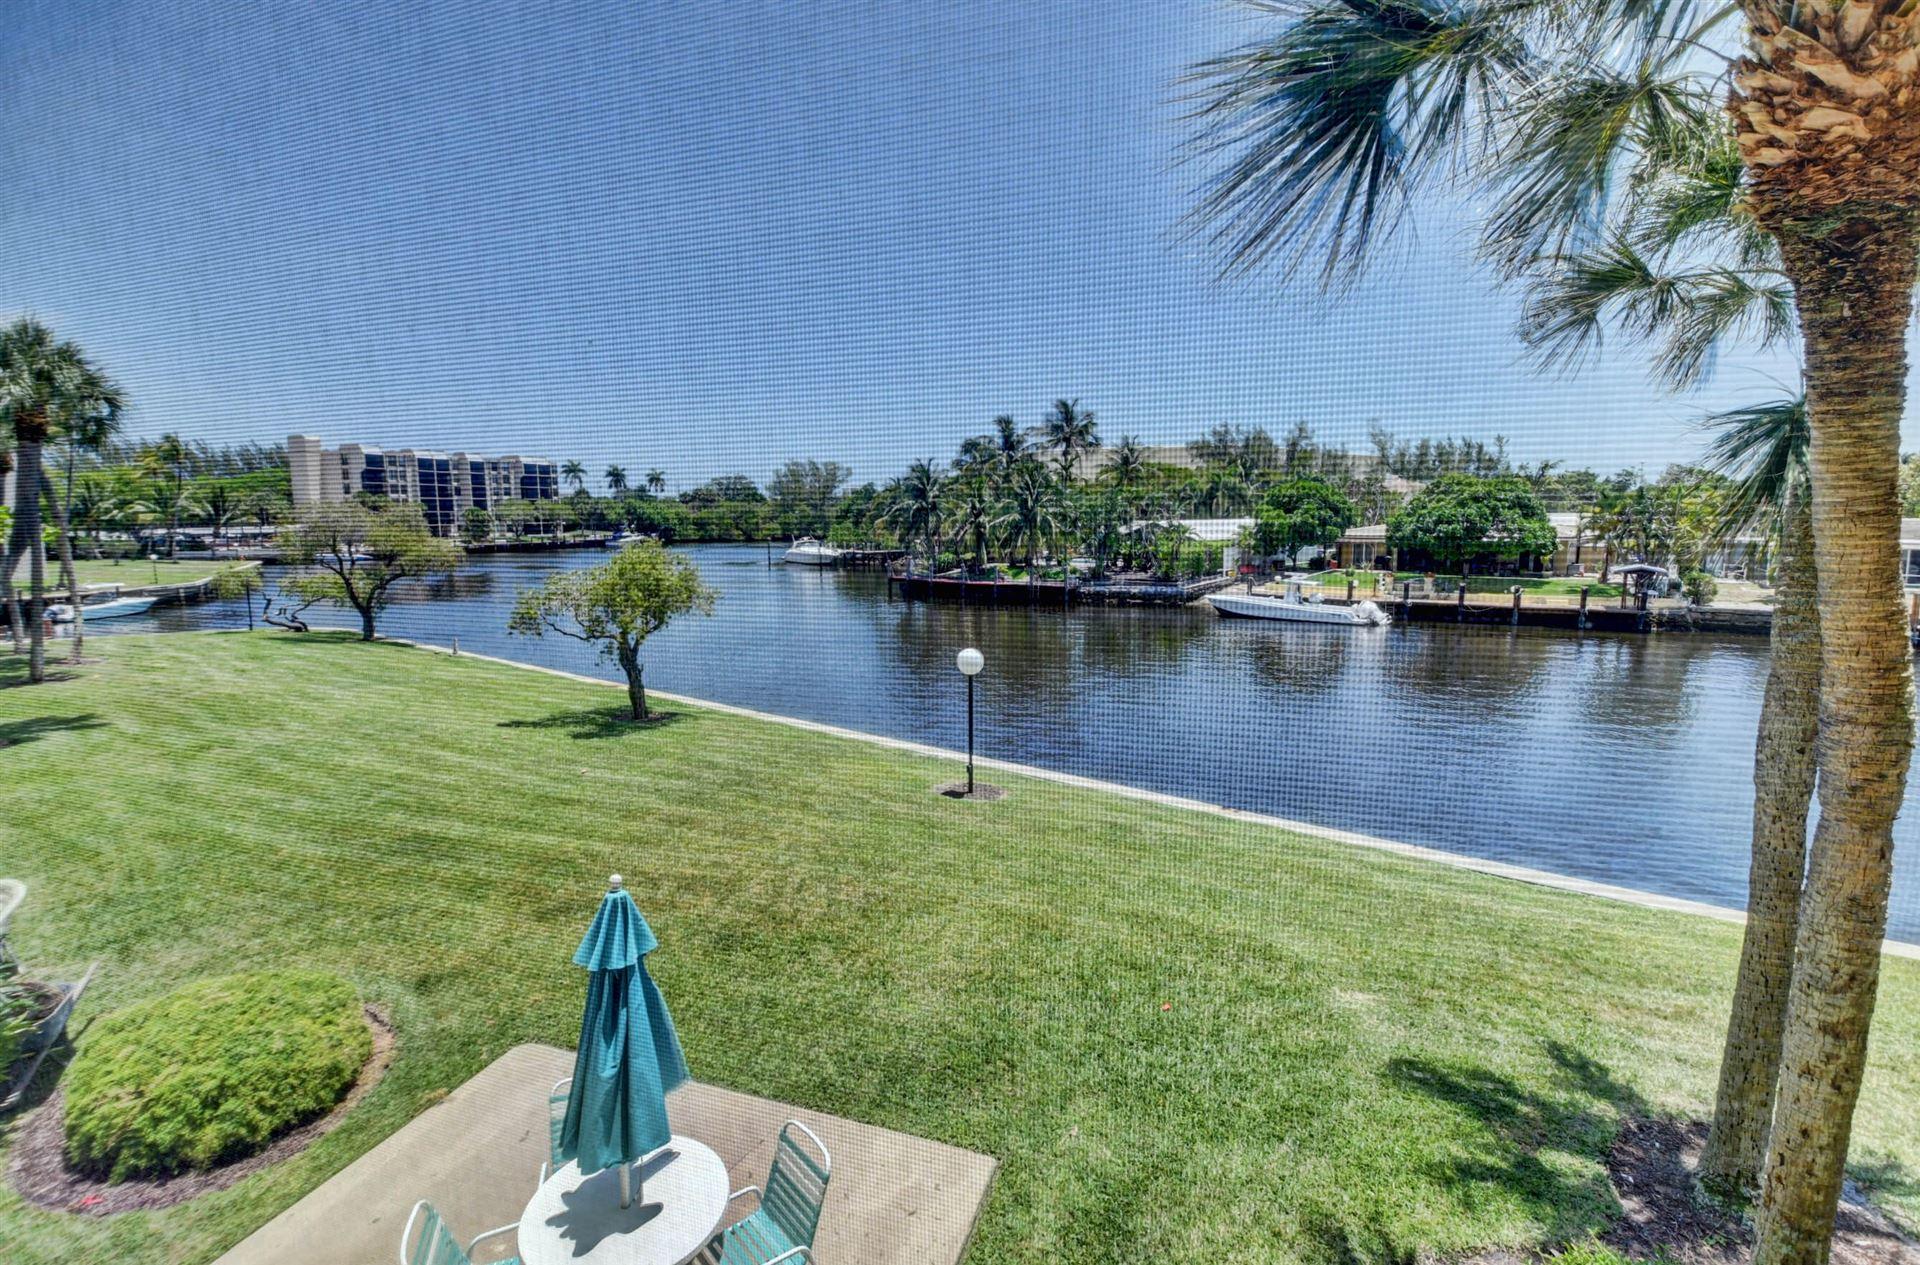 Photo of 13 Royal Palm Way #205, Boca Raton, FL 33432 (MLS # RX-10725424)